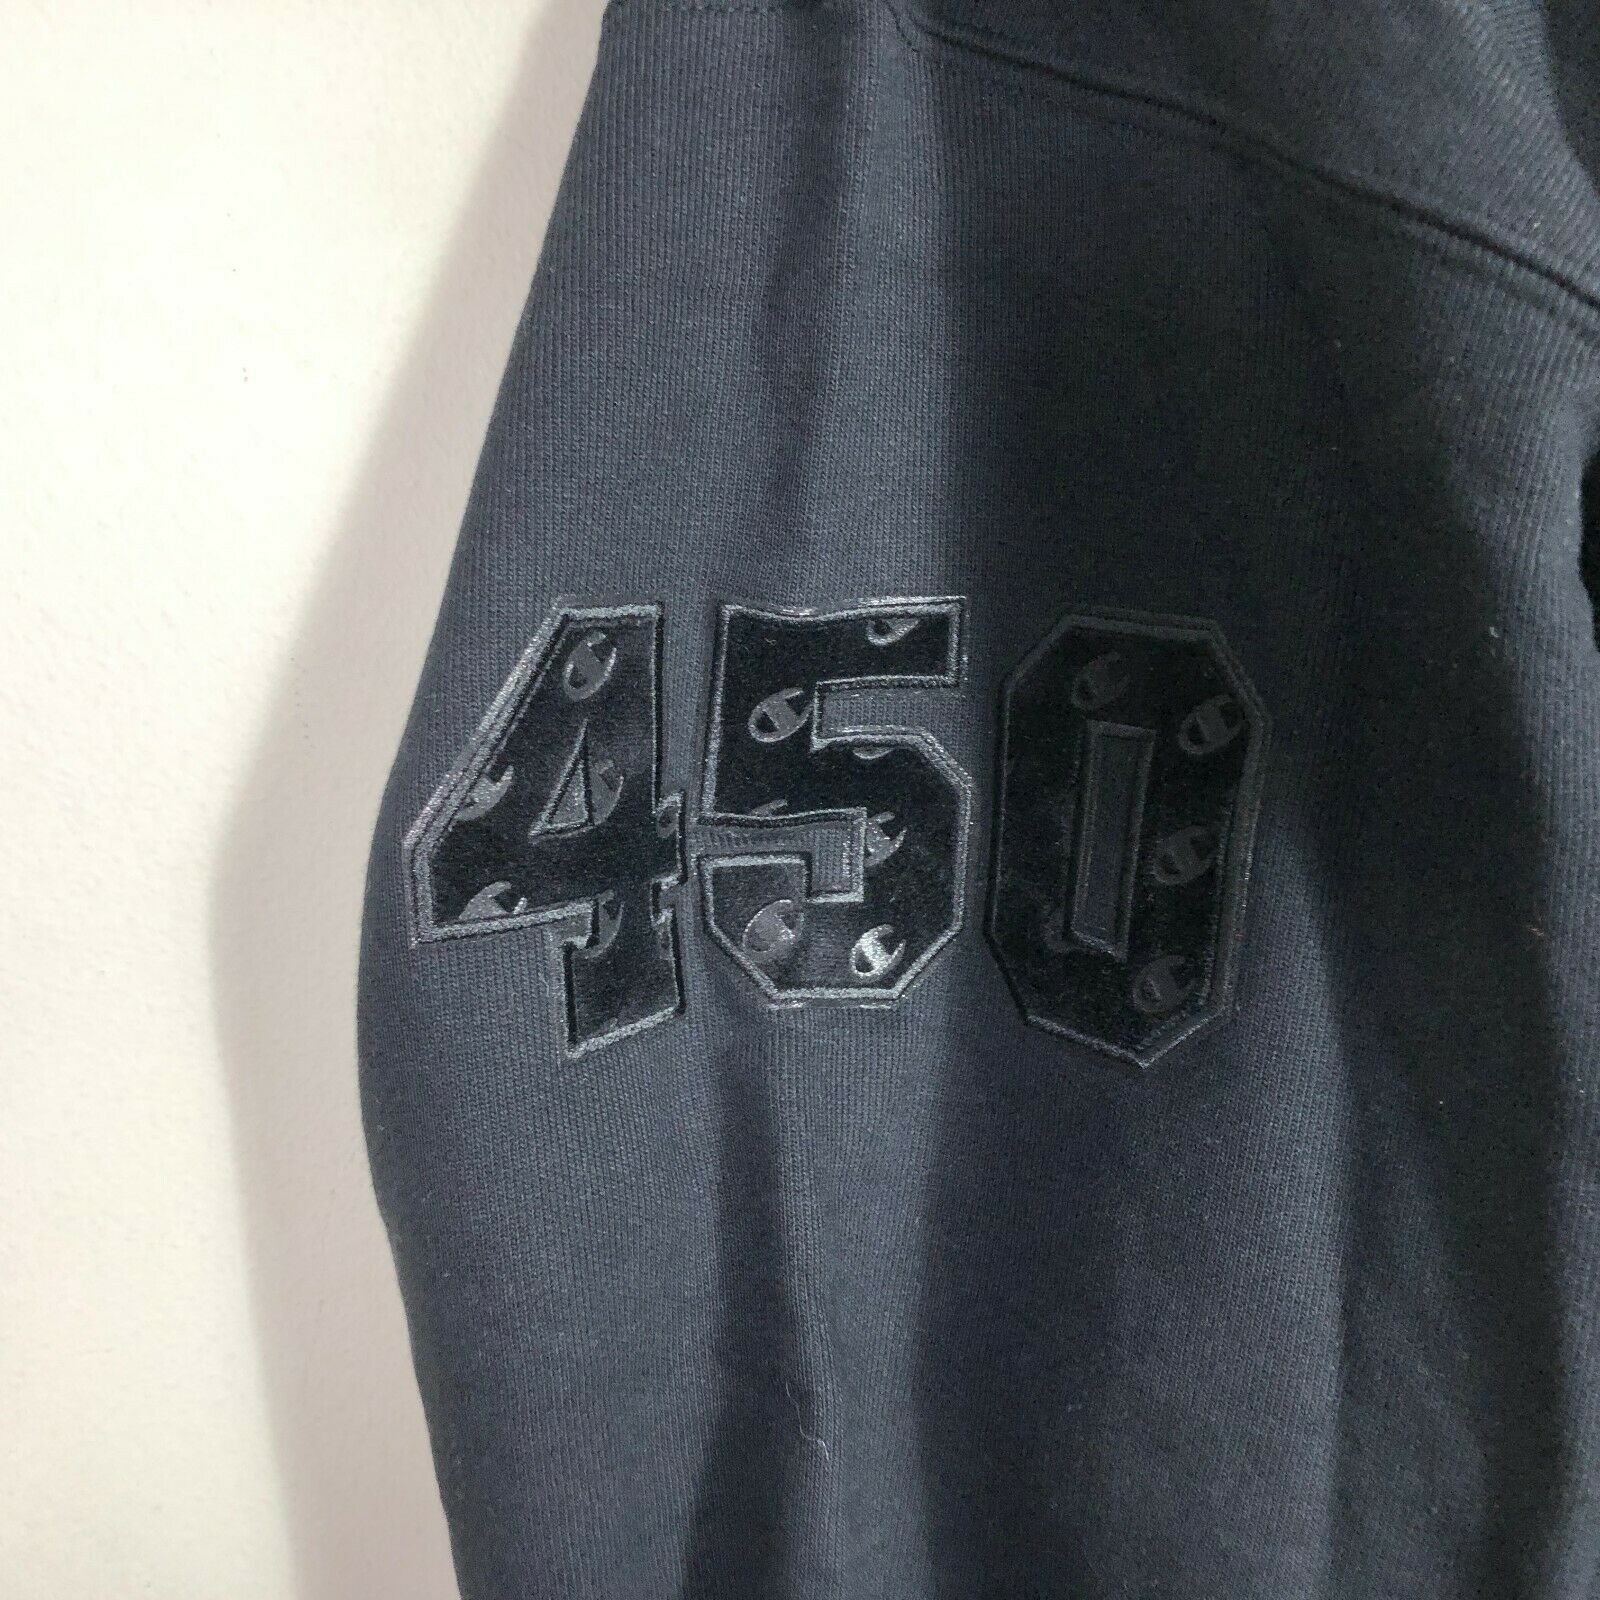 Vintage Champion Crew Neck Reverse Weave Sweatshirt XL NBA NBPA Sweatshirt image 3